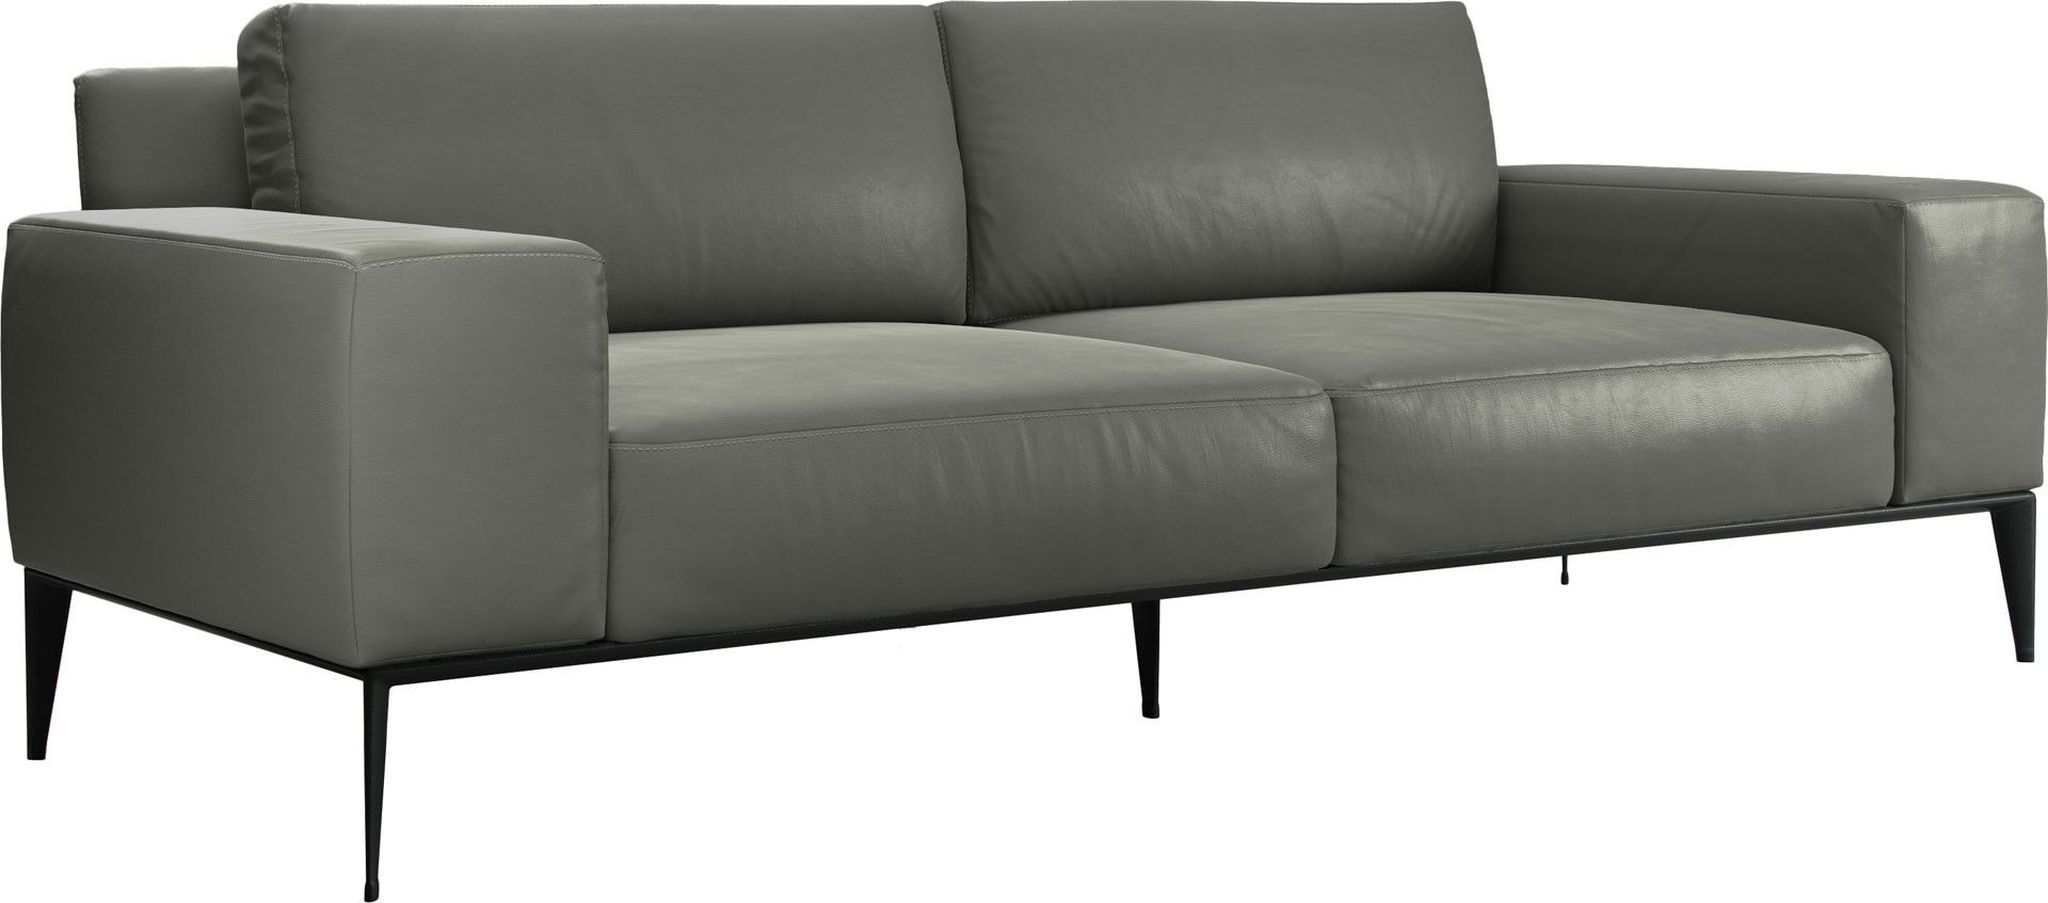 3299 00 Elizabeth Sofa In Grey Sofas Chairs Maplenest Sofa Sofa Furniture Gray Sofa